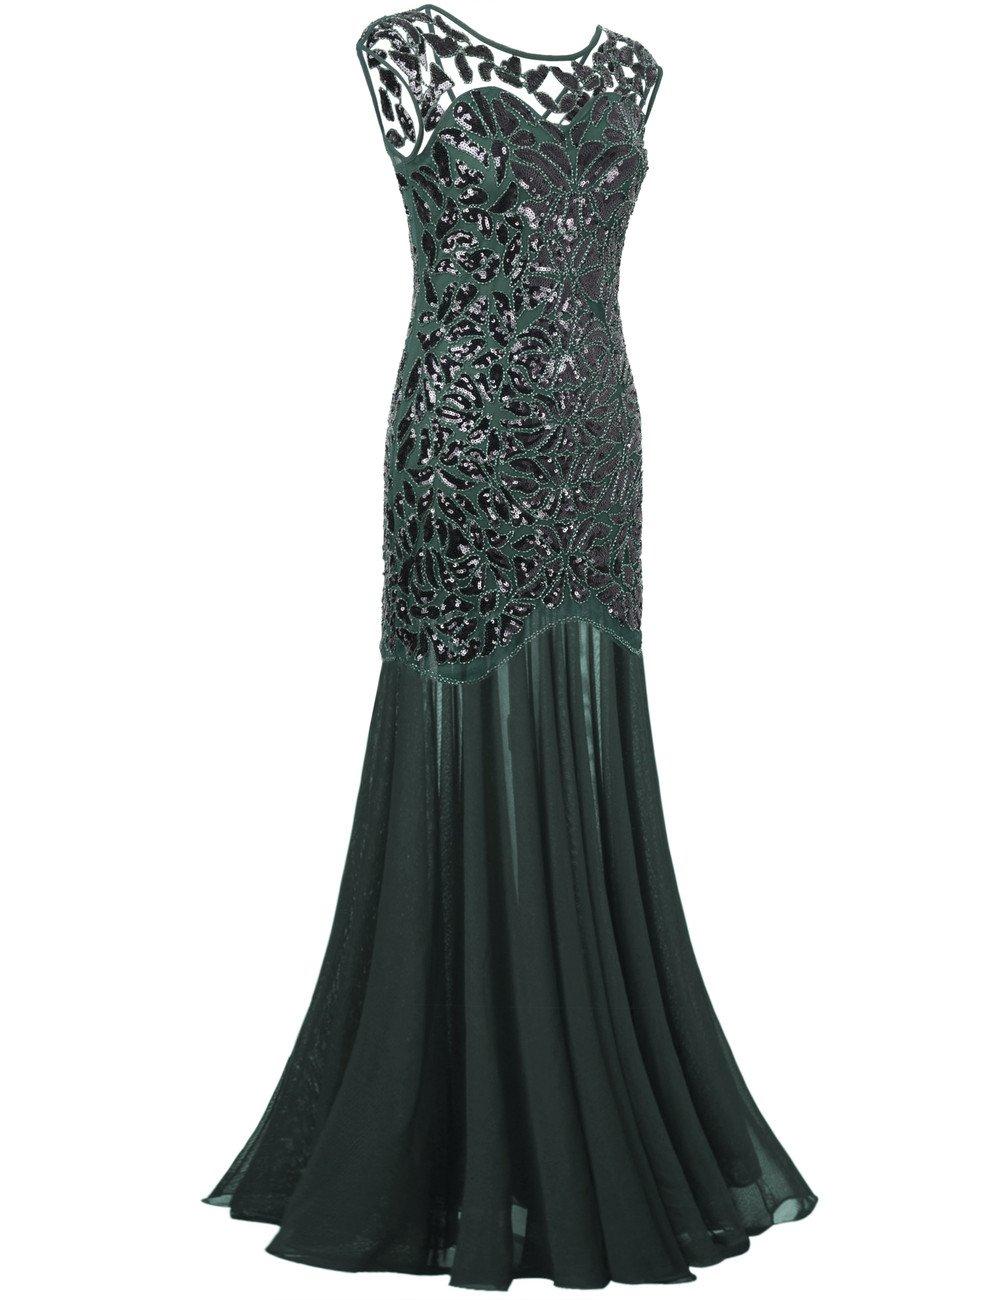 99086f3a87 Galleon - PrettyGuide Women  s 1920s Black Sequin Gatsby Maxi Long Evening  Prom Dress